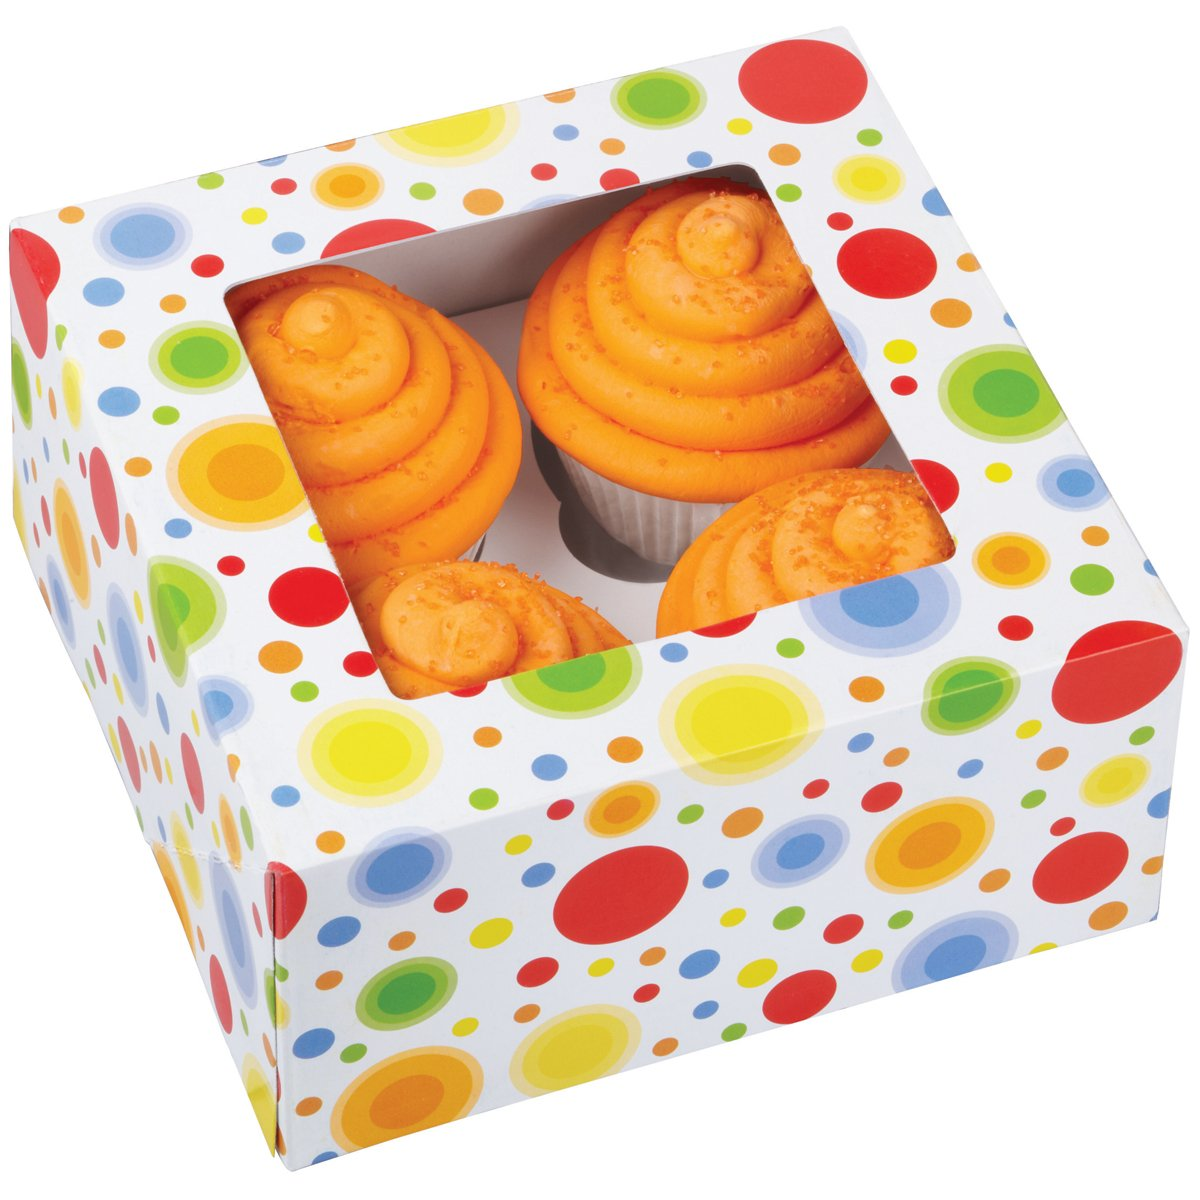 Amazon.com: Wilton 415-0735 3/Pack 4-Cavity Circles Cupcake Box: Scrapbooking Supplies: Kitchen & Dining